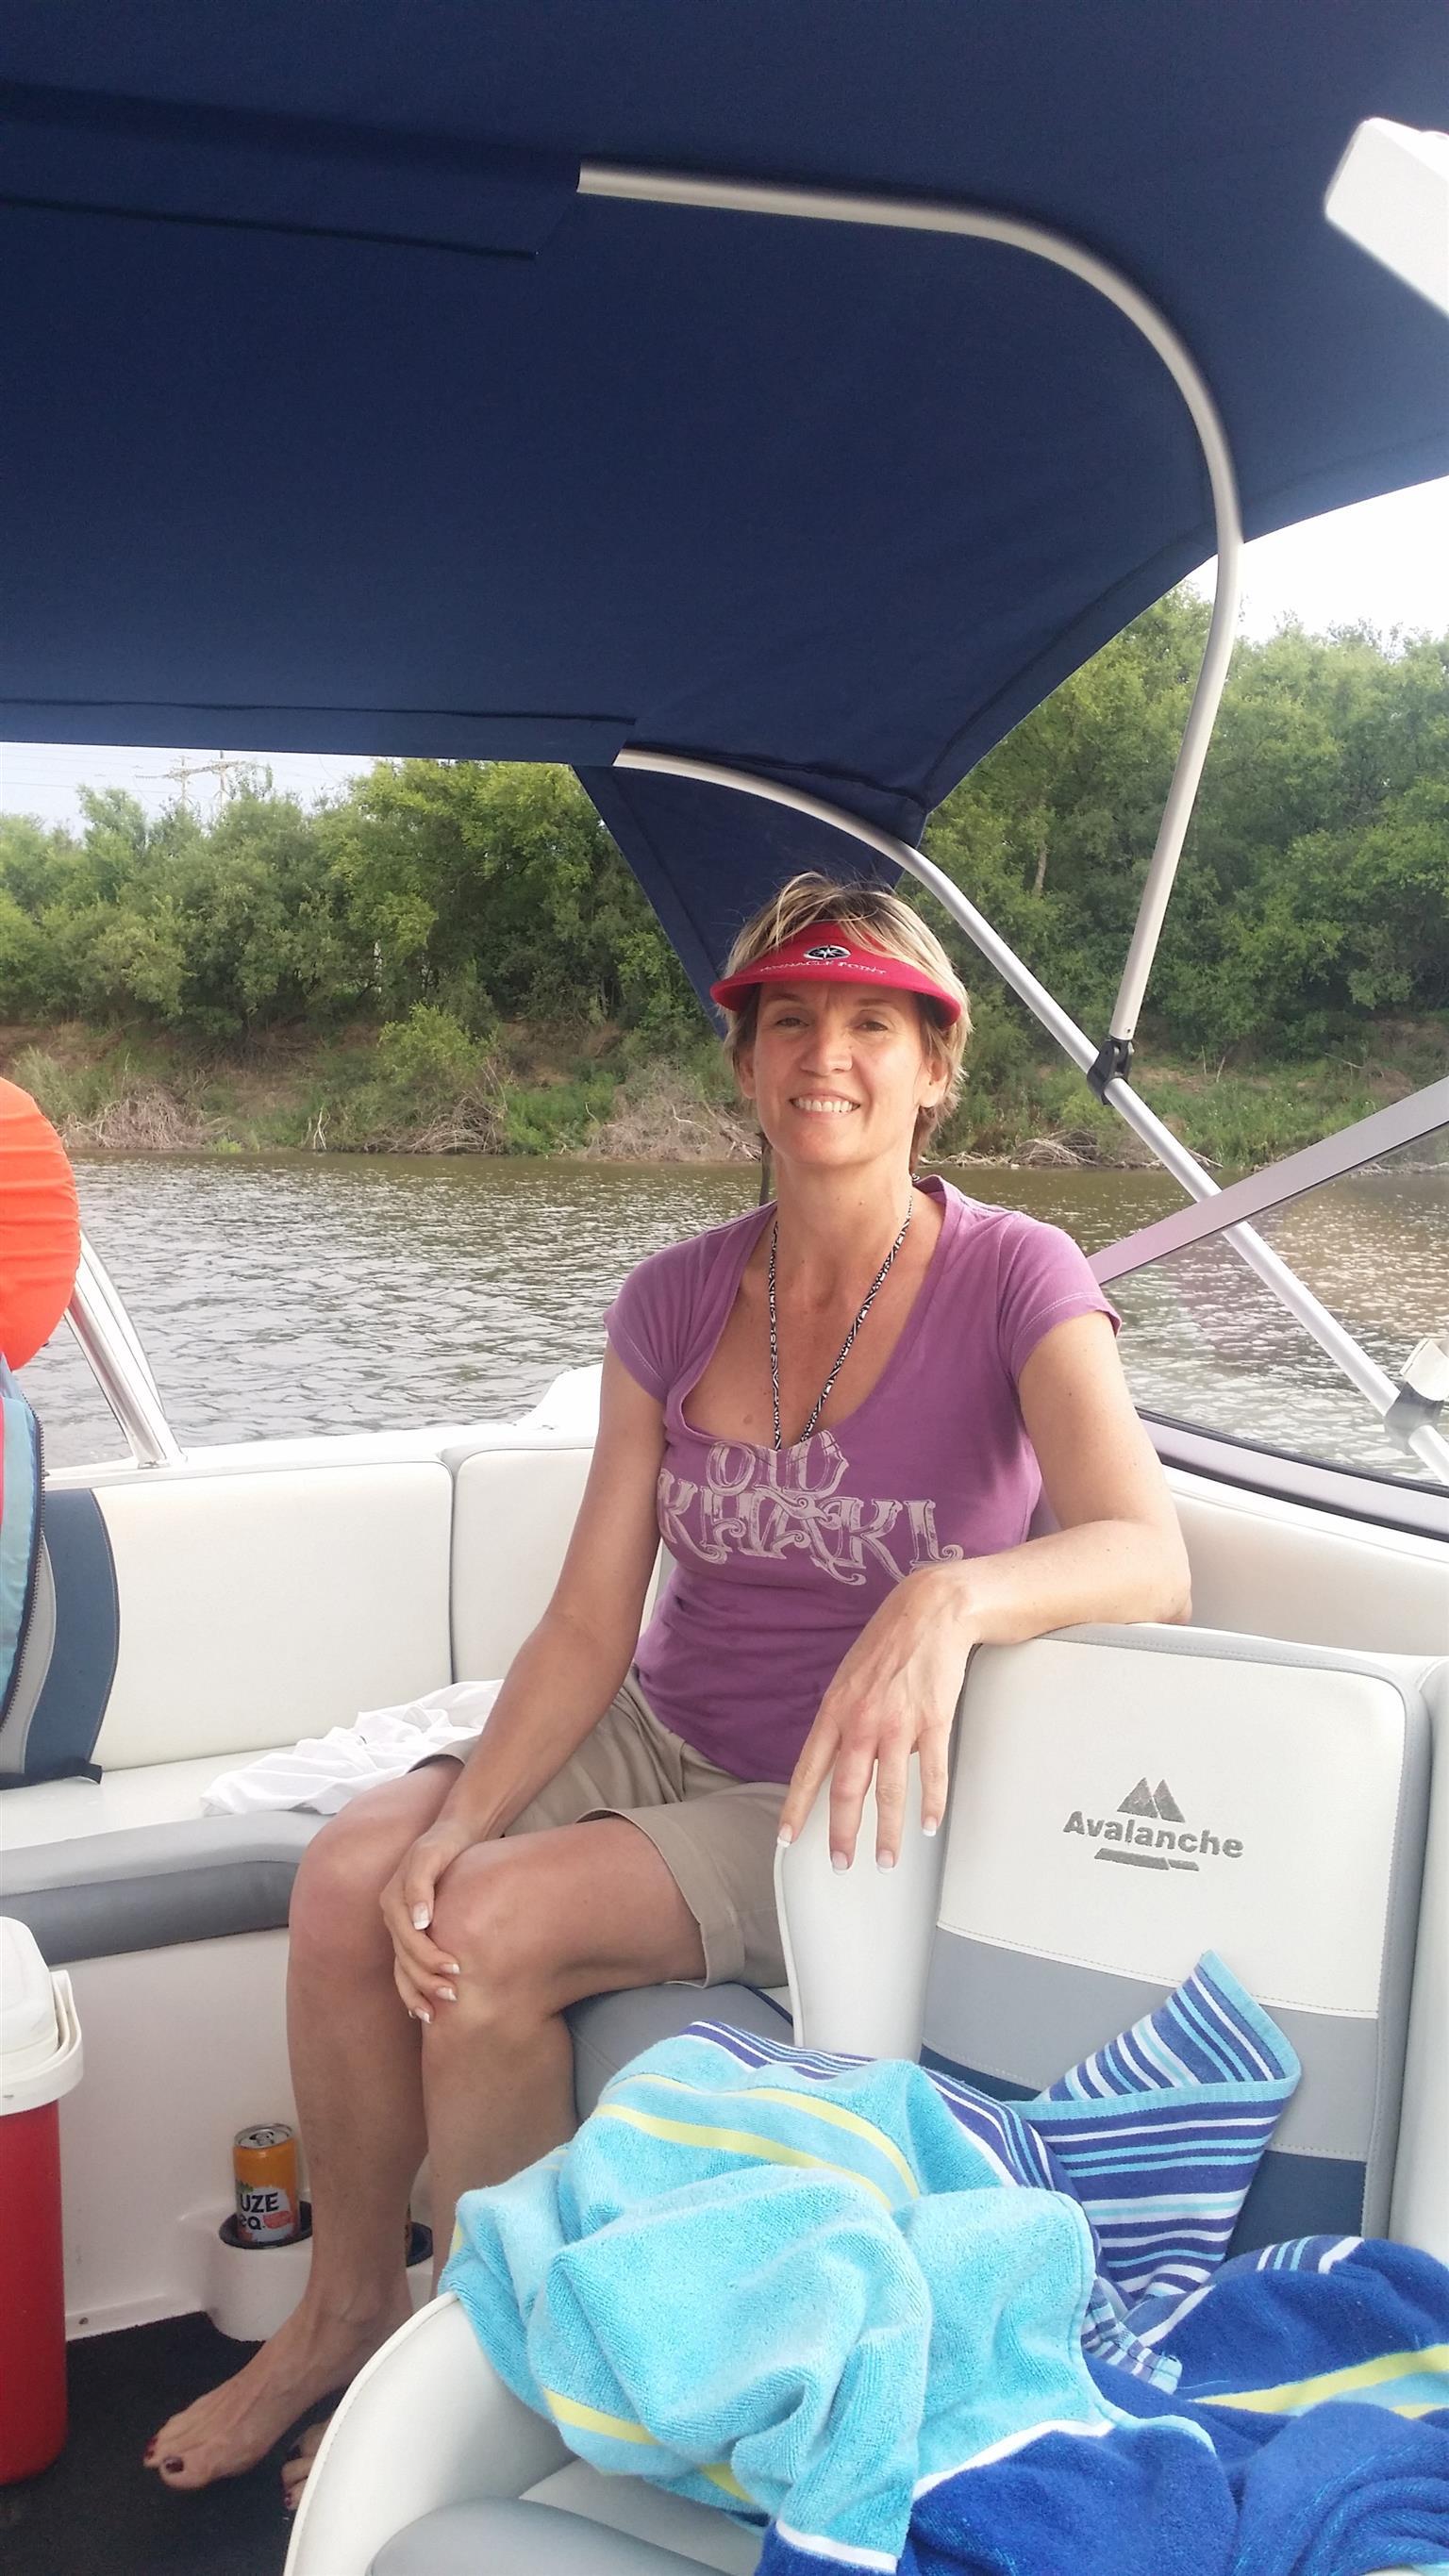 Family sport or fishermans boat